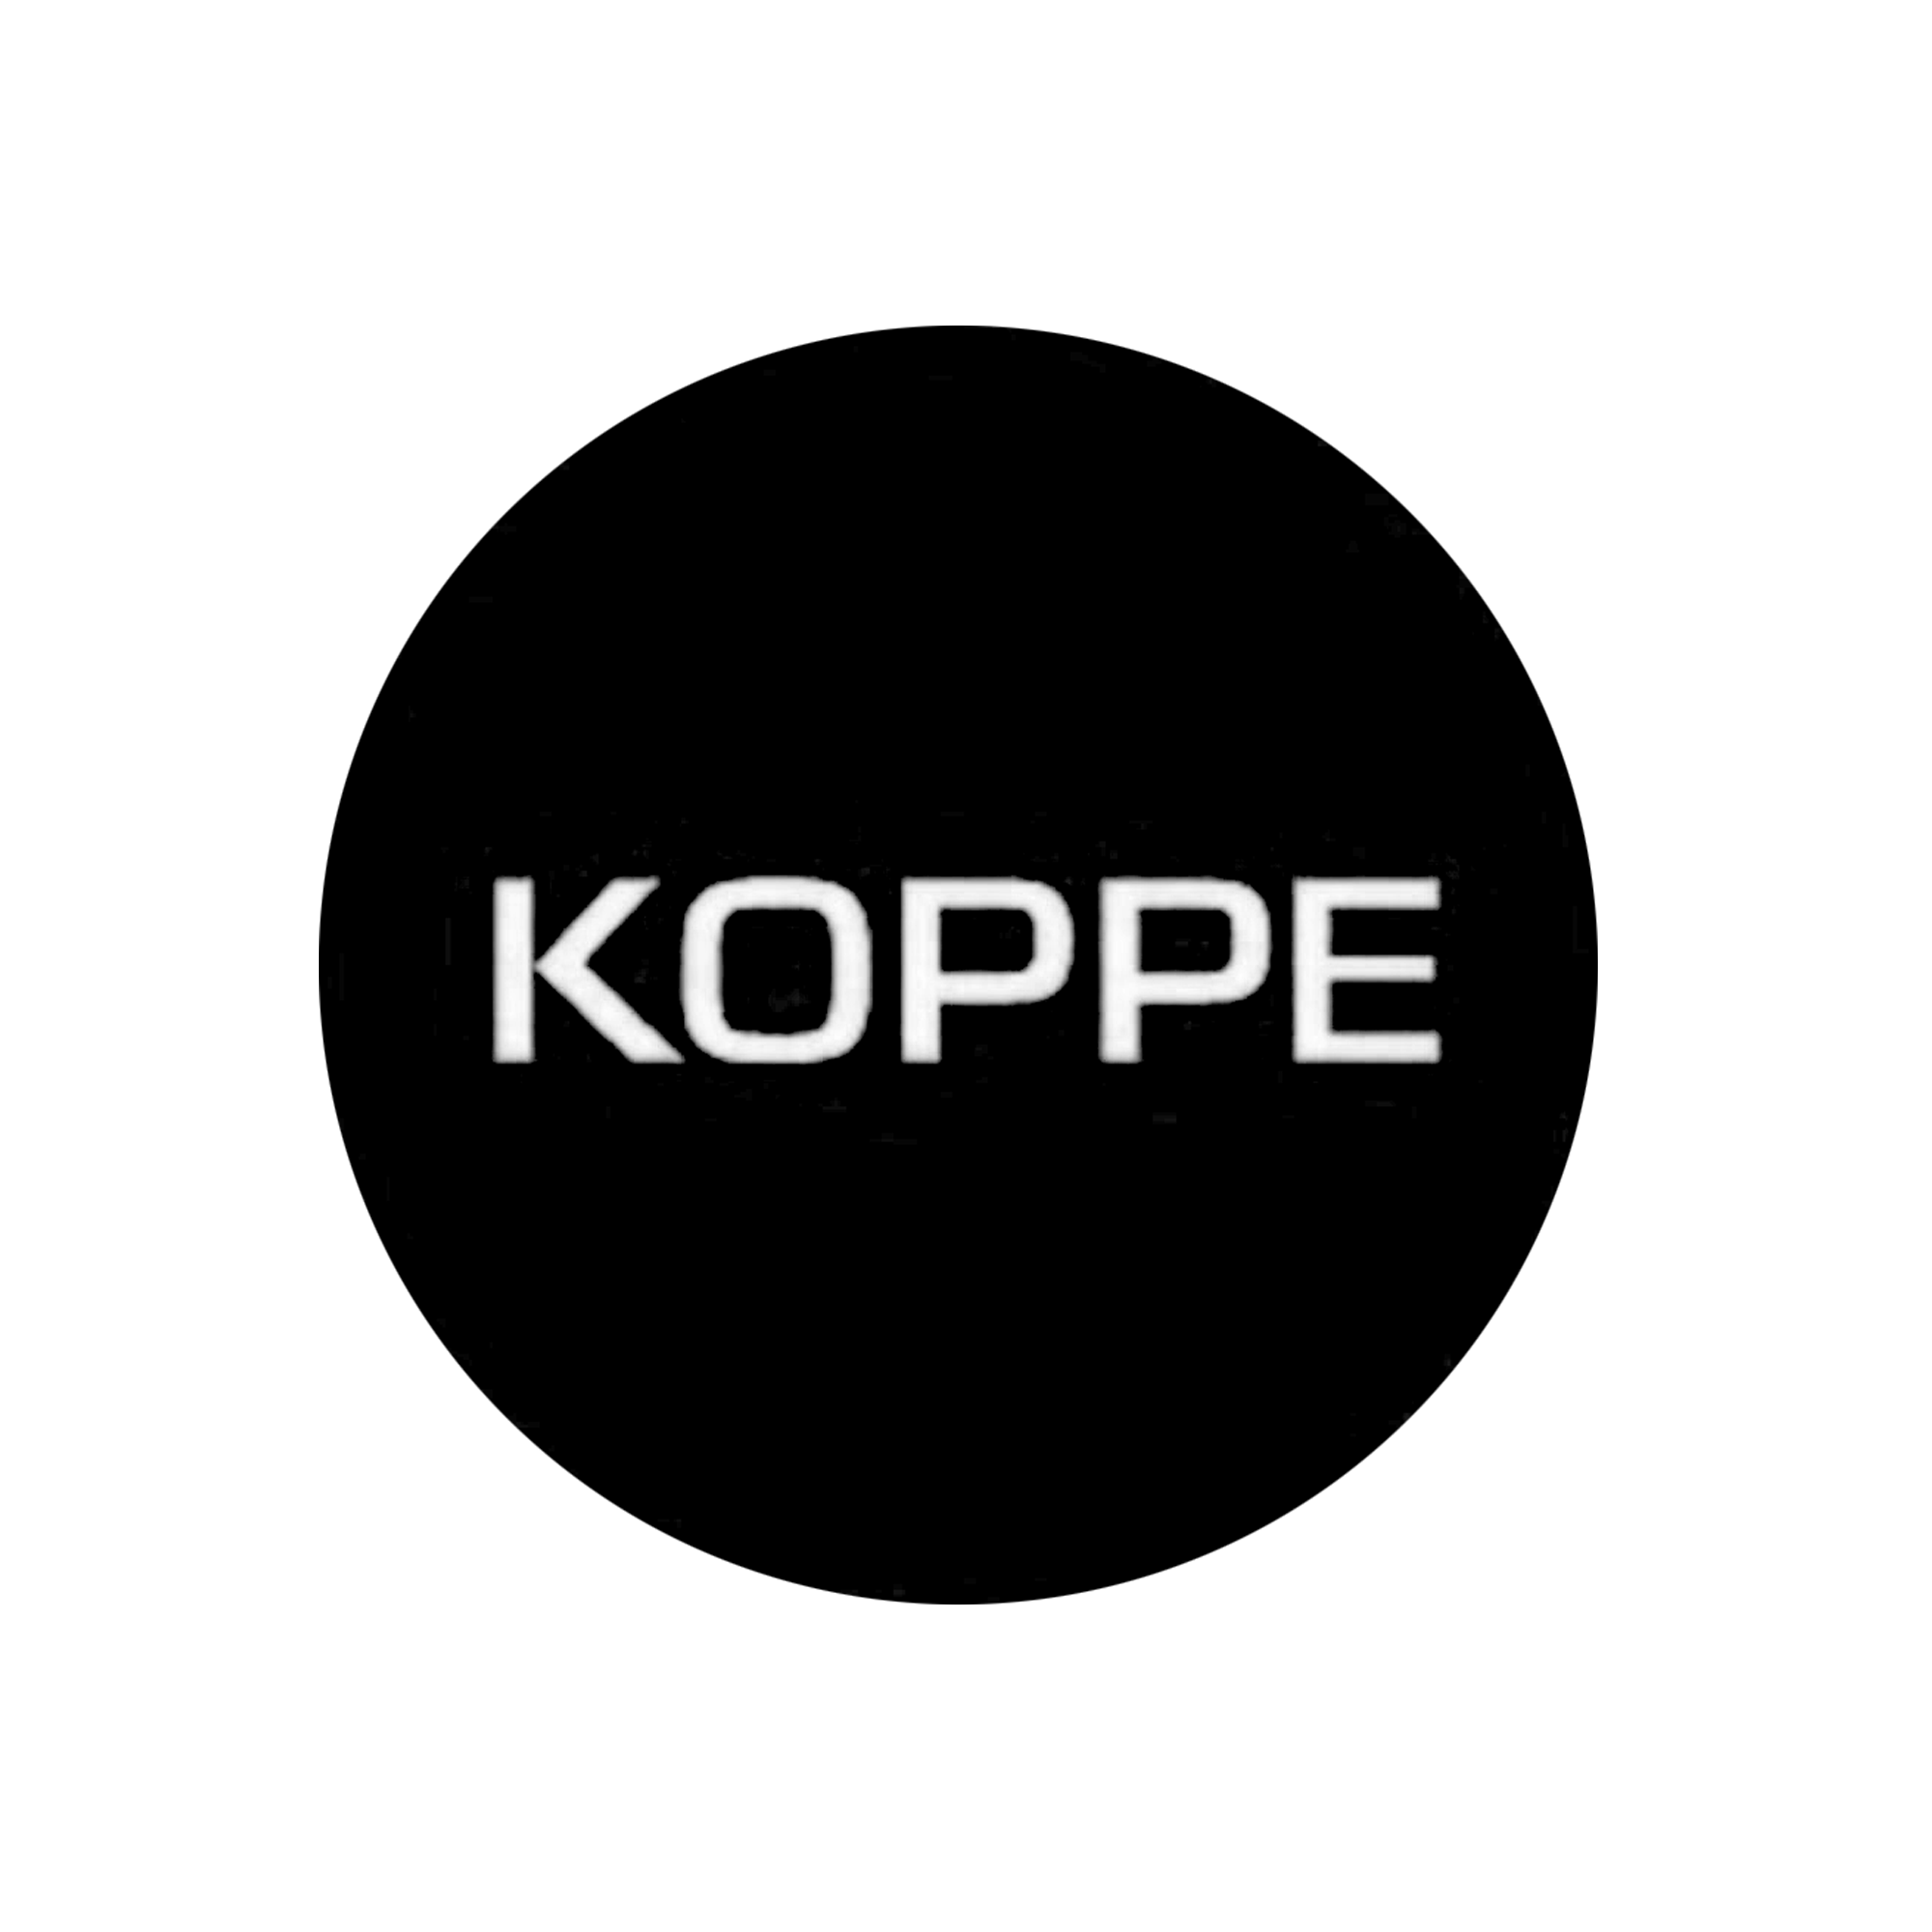 www.koppe.at